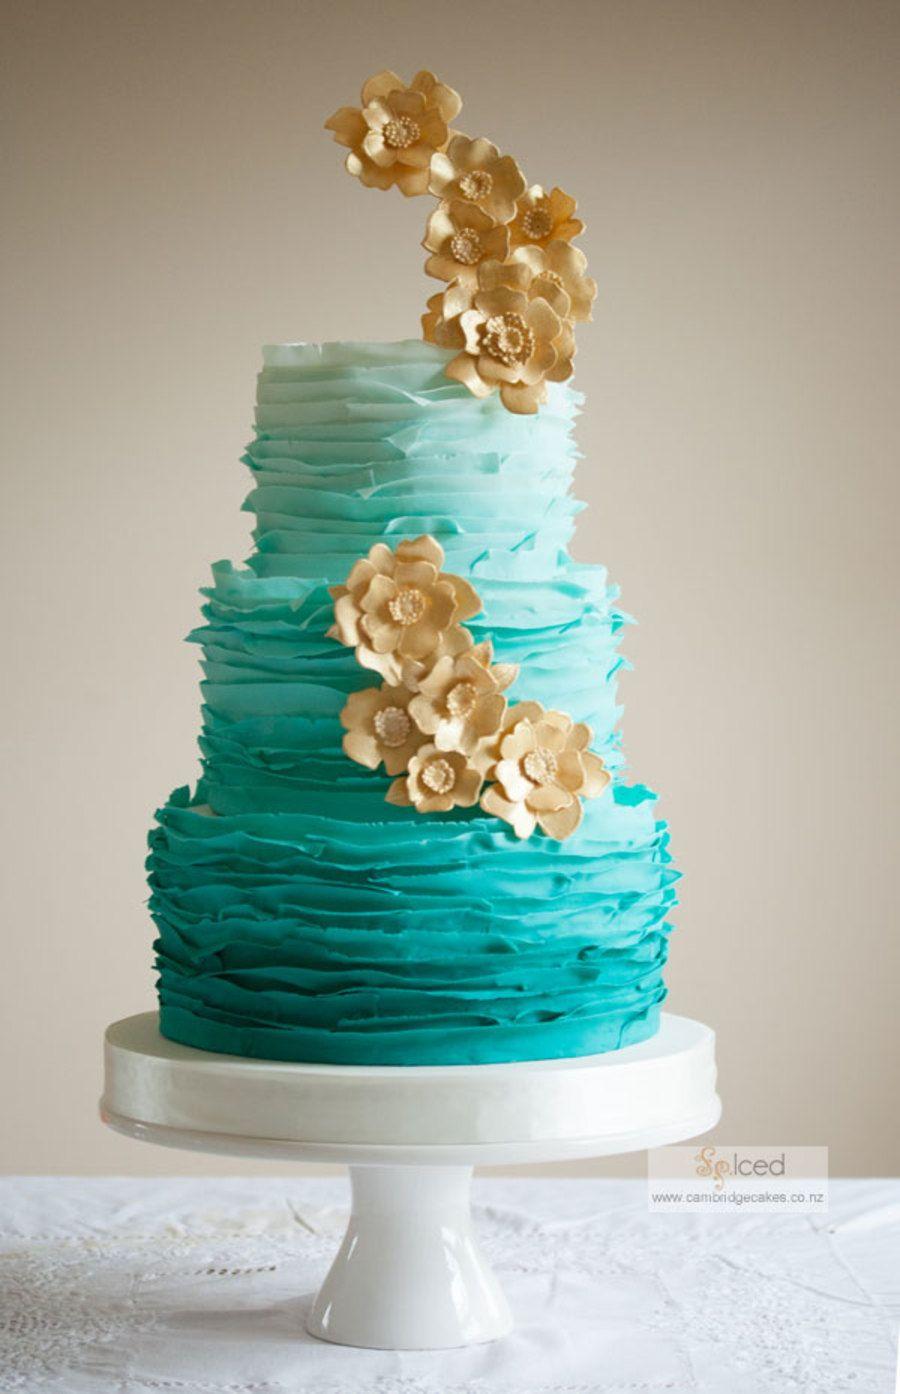 The blue cake company wedding cakes birthday cakes 2016 car release - Theme Wedding Cakes Part 4